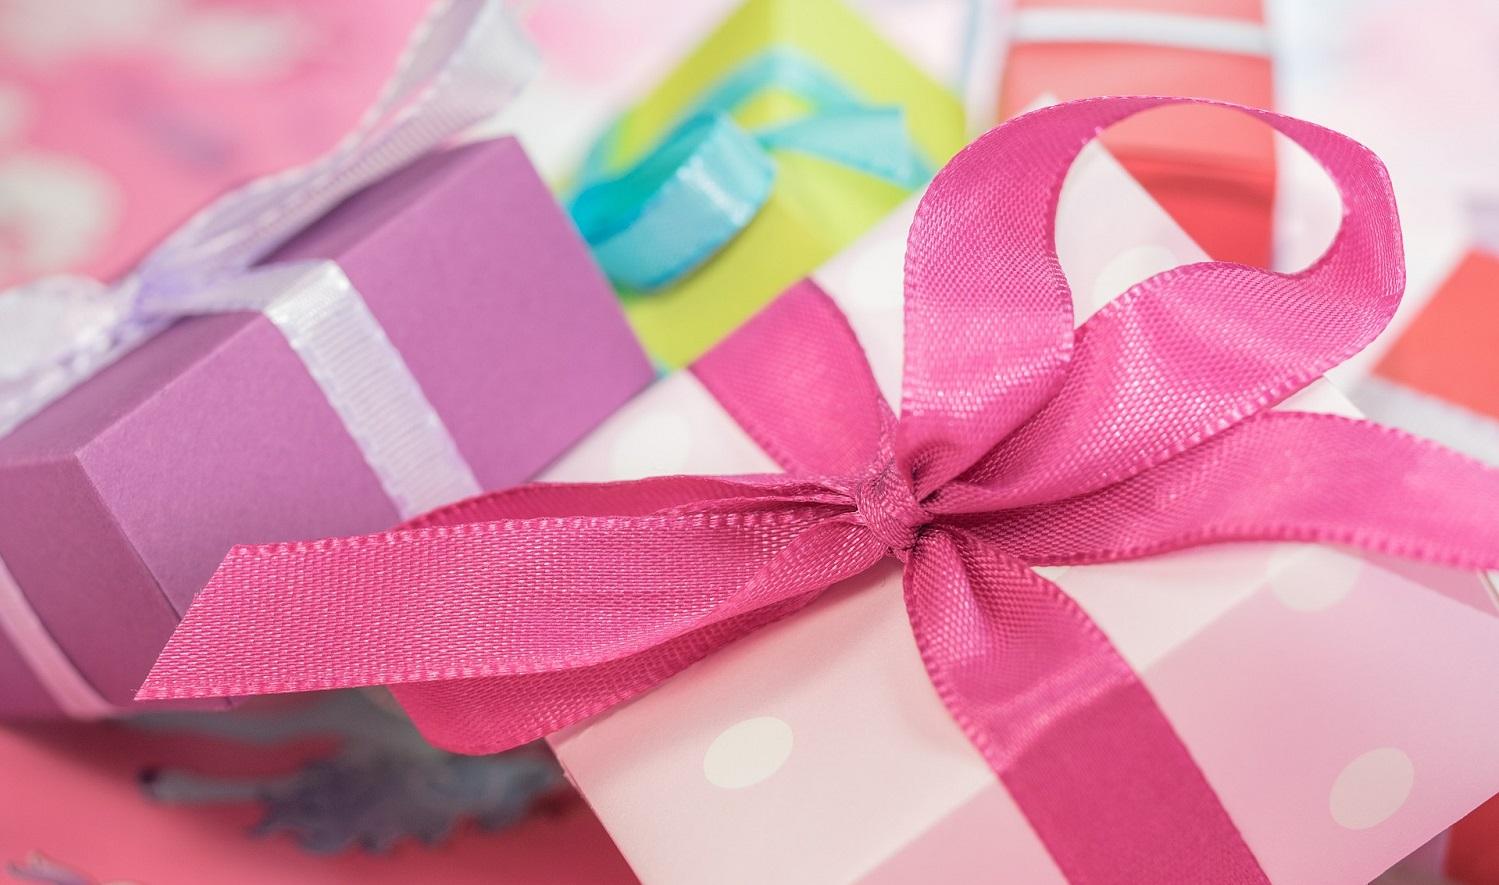 8 beauty δώρα που θα θέλαμε να μας χαρίσουν φέτος τα Χριστούγεννα